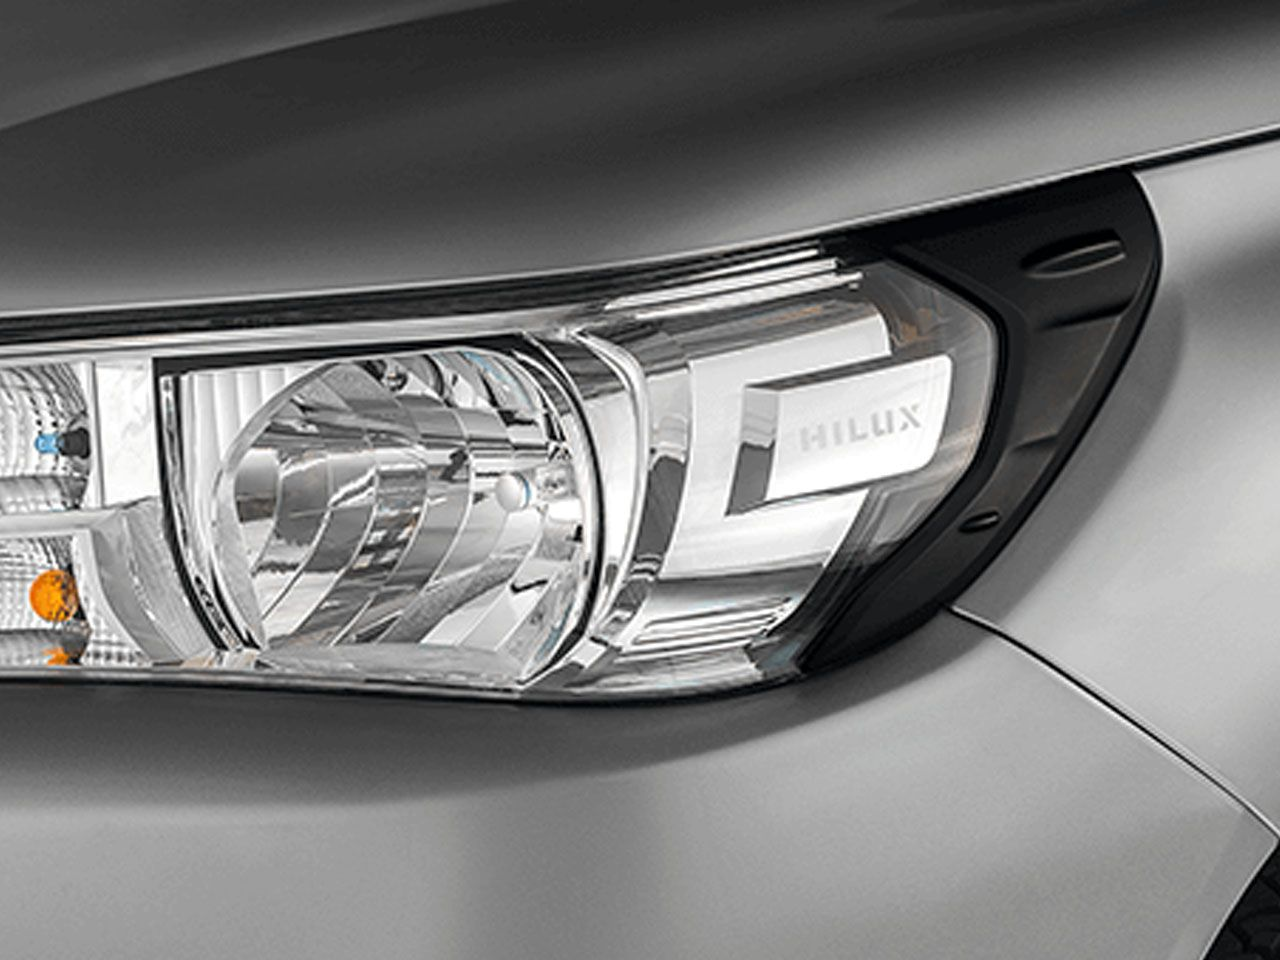 Aplique Preto Fosco do Farol Hilux STD SR SRV SRX GR-S Cabine Simples Chassi  - Mirai Peças Toyota